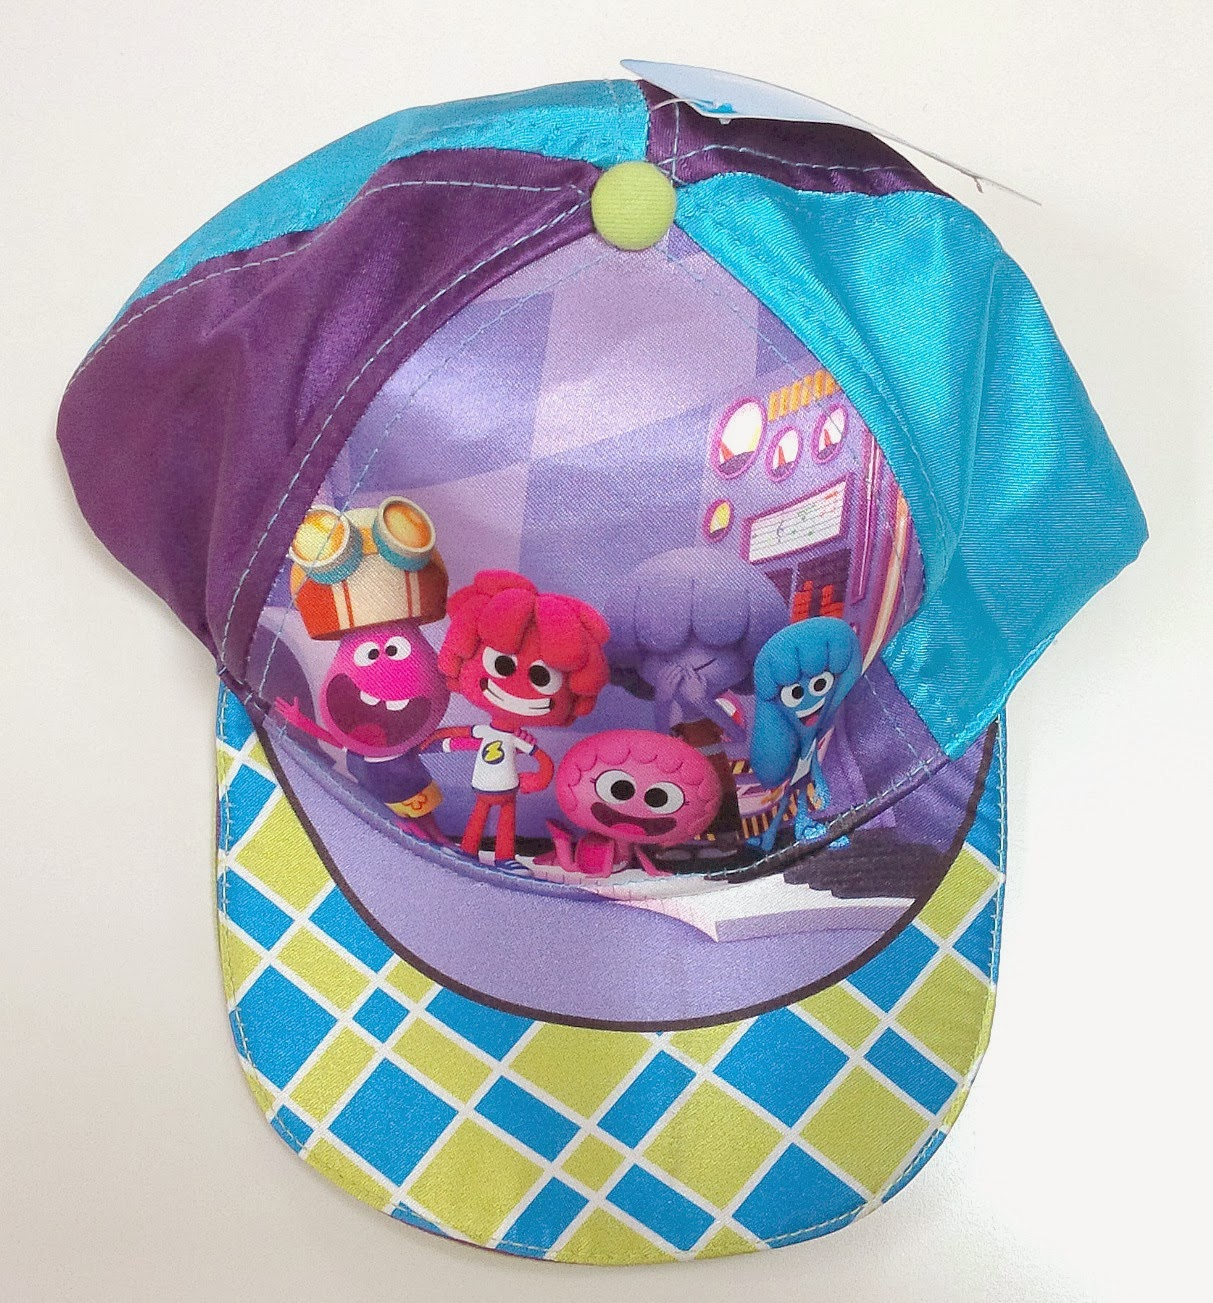 Jelly Jamm UK. Jelly Jamm toys, Jelly Jamm cap